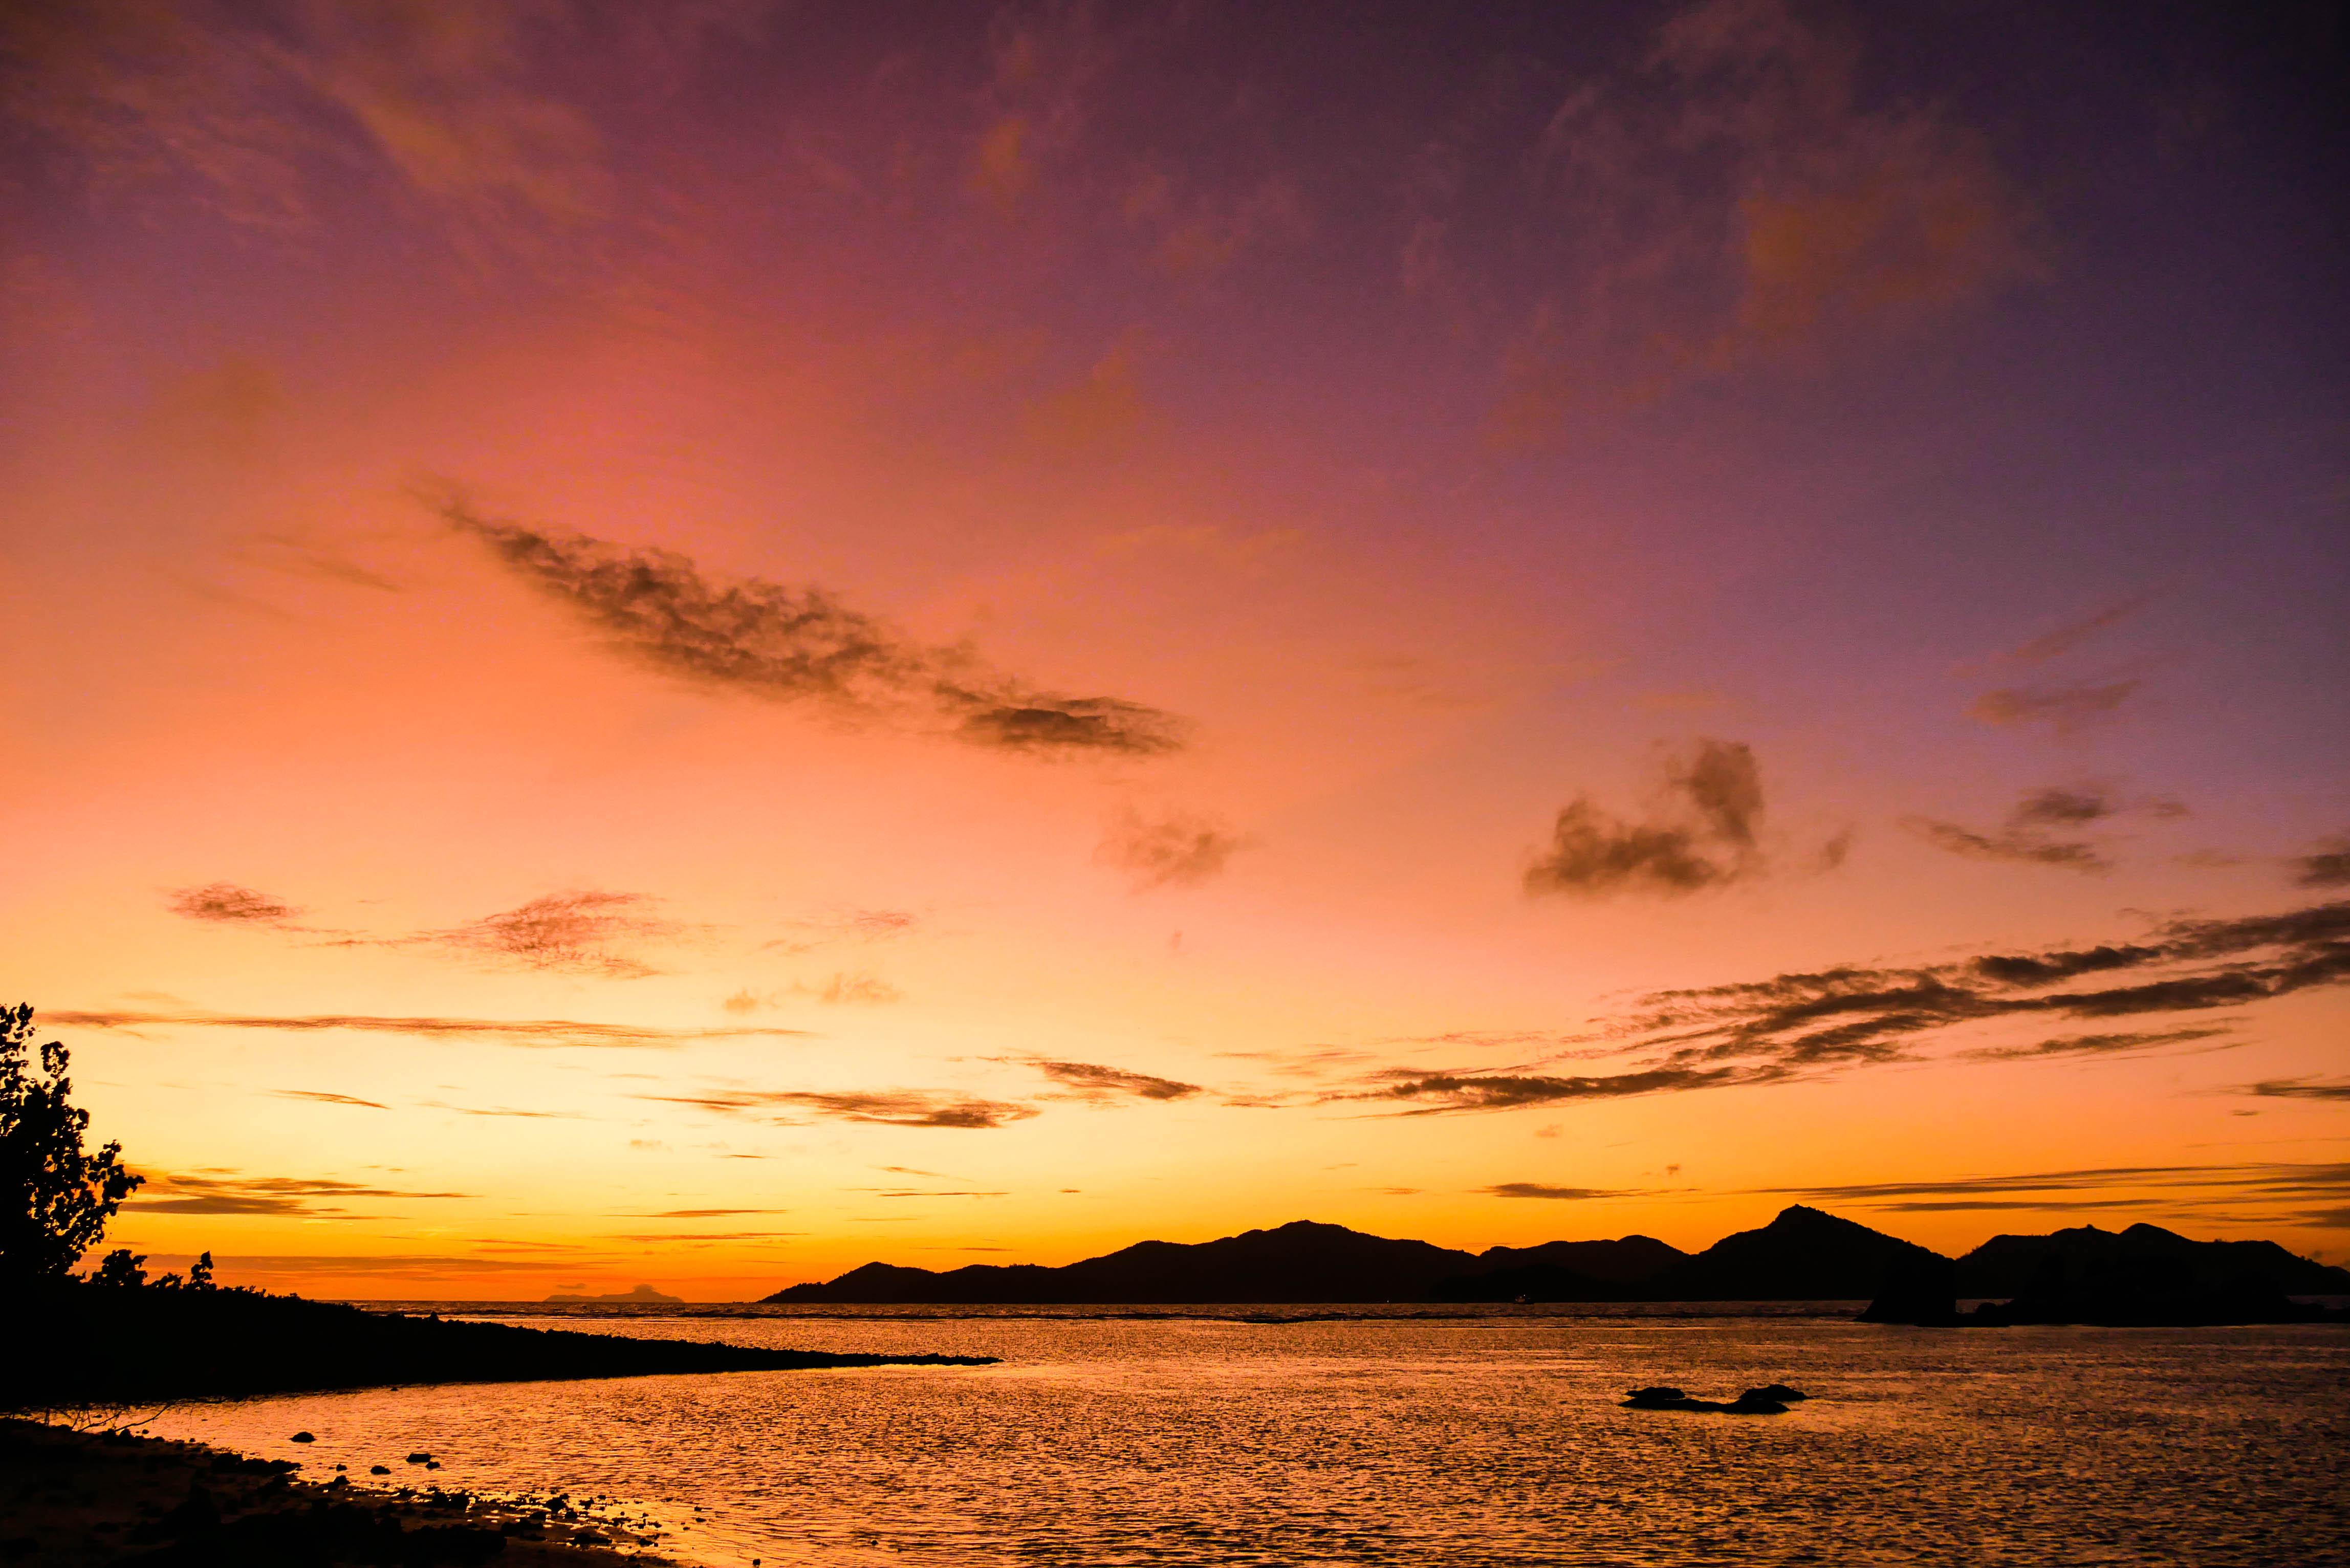 Sonnenuntergang auf La Digue, Seychellen